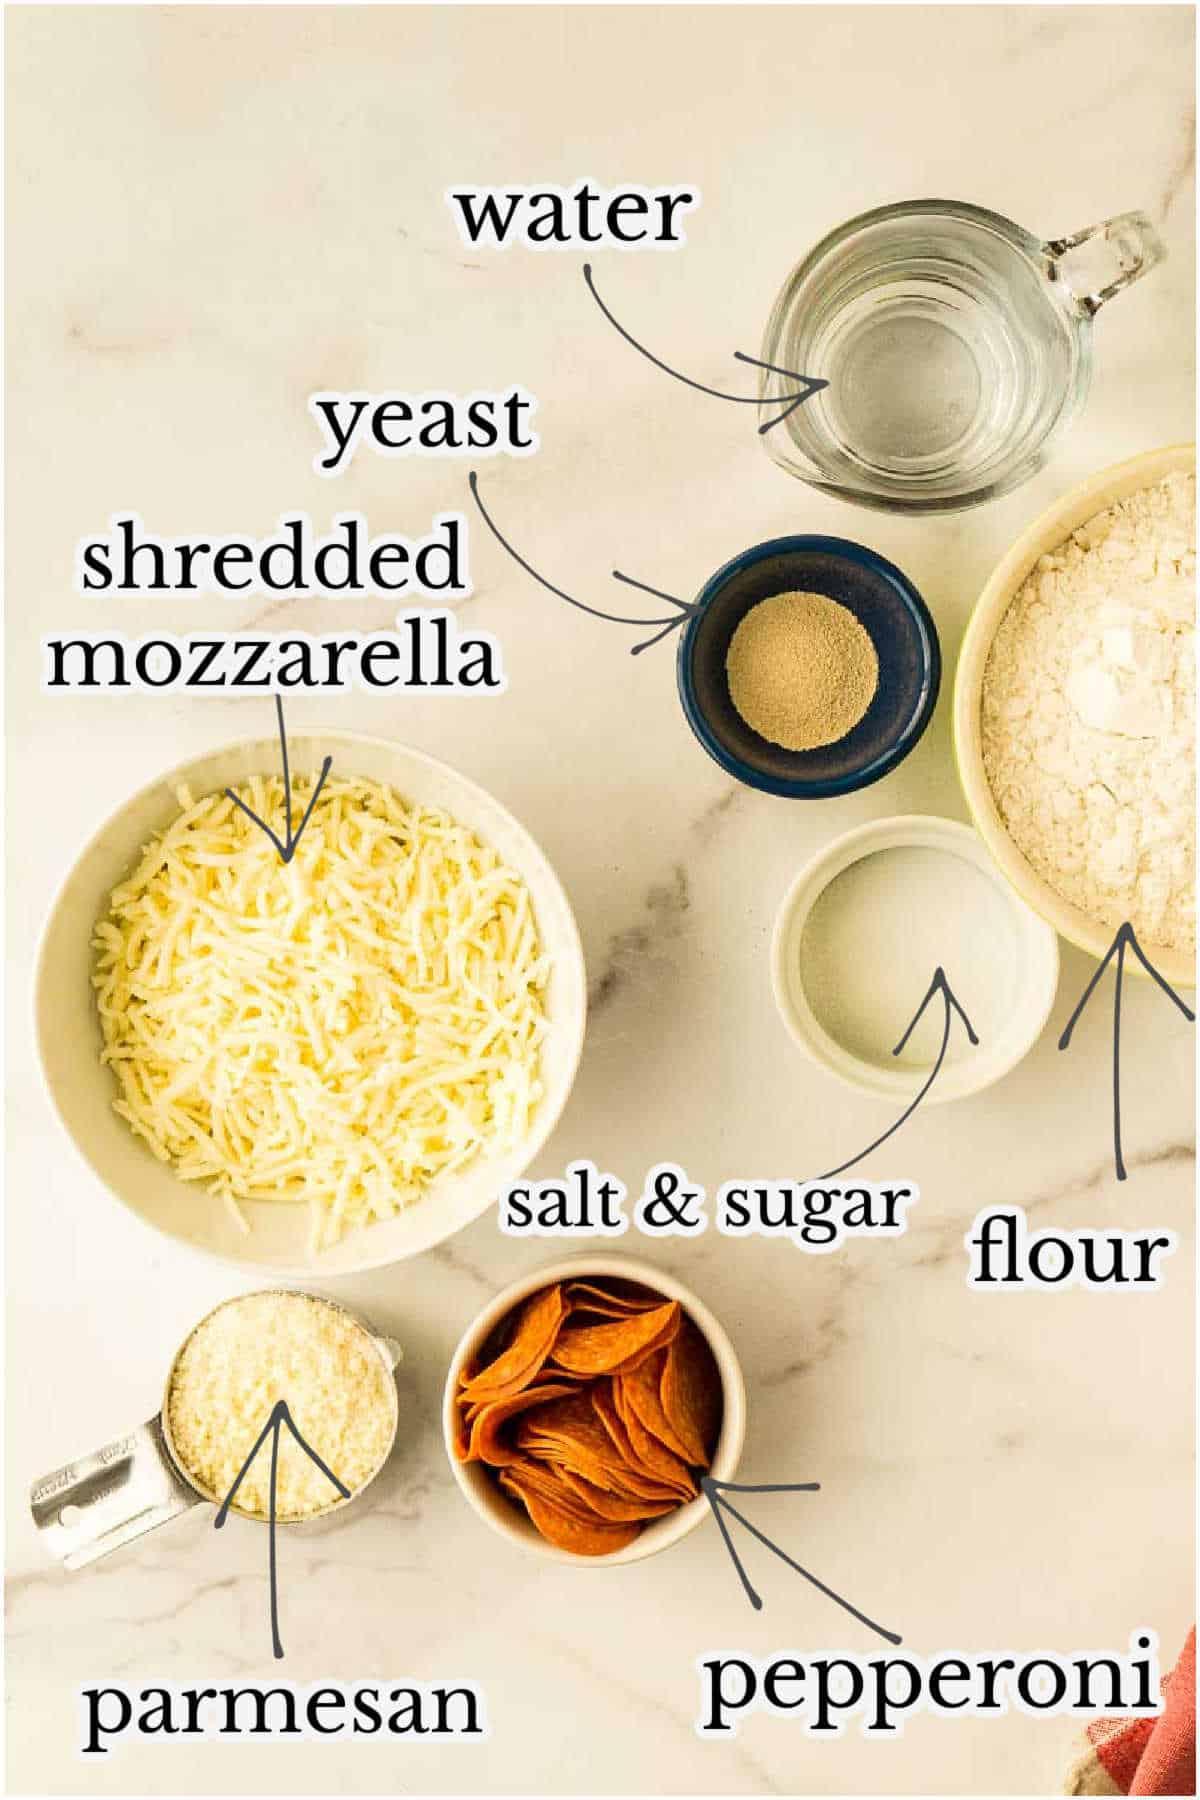 flour, salt, yeast, pepperoni, mozzarella, and parmesan on marble counter